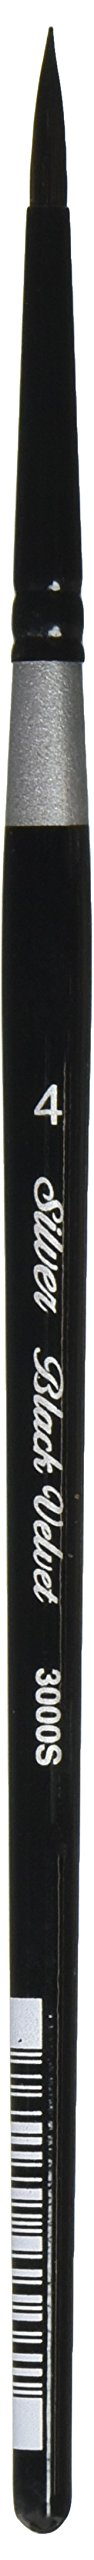 Silver Brush 3000S-4 Black Velvet Short Handle Blend Squirrel and Risslon Brush, Round, Size 4 (Color: Round, Tamaño: Size 4)